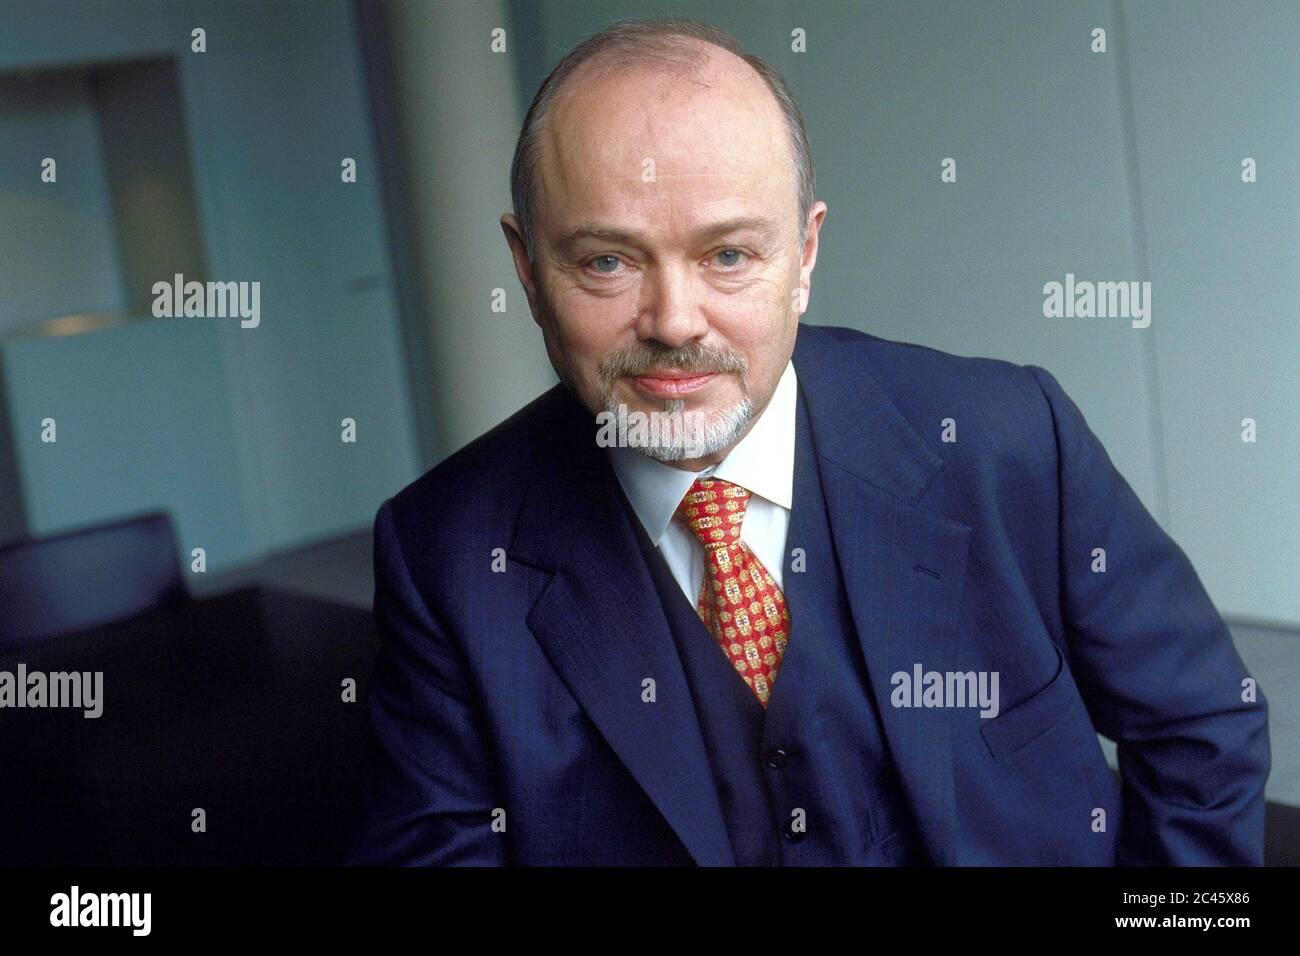 Dr. Richard R. Klein - Board member of RWE AG Stock Photo